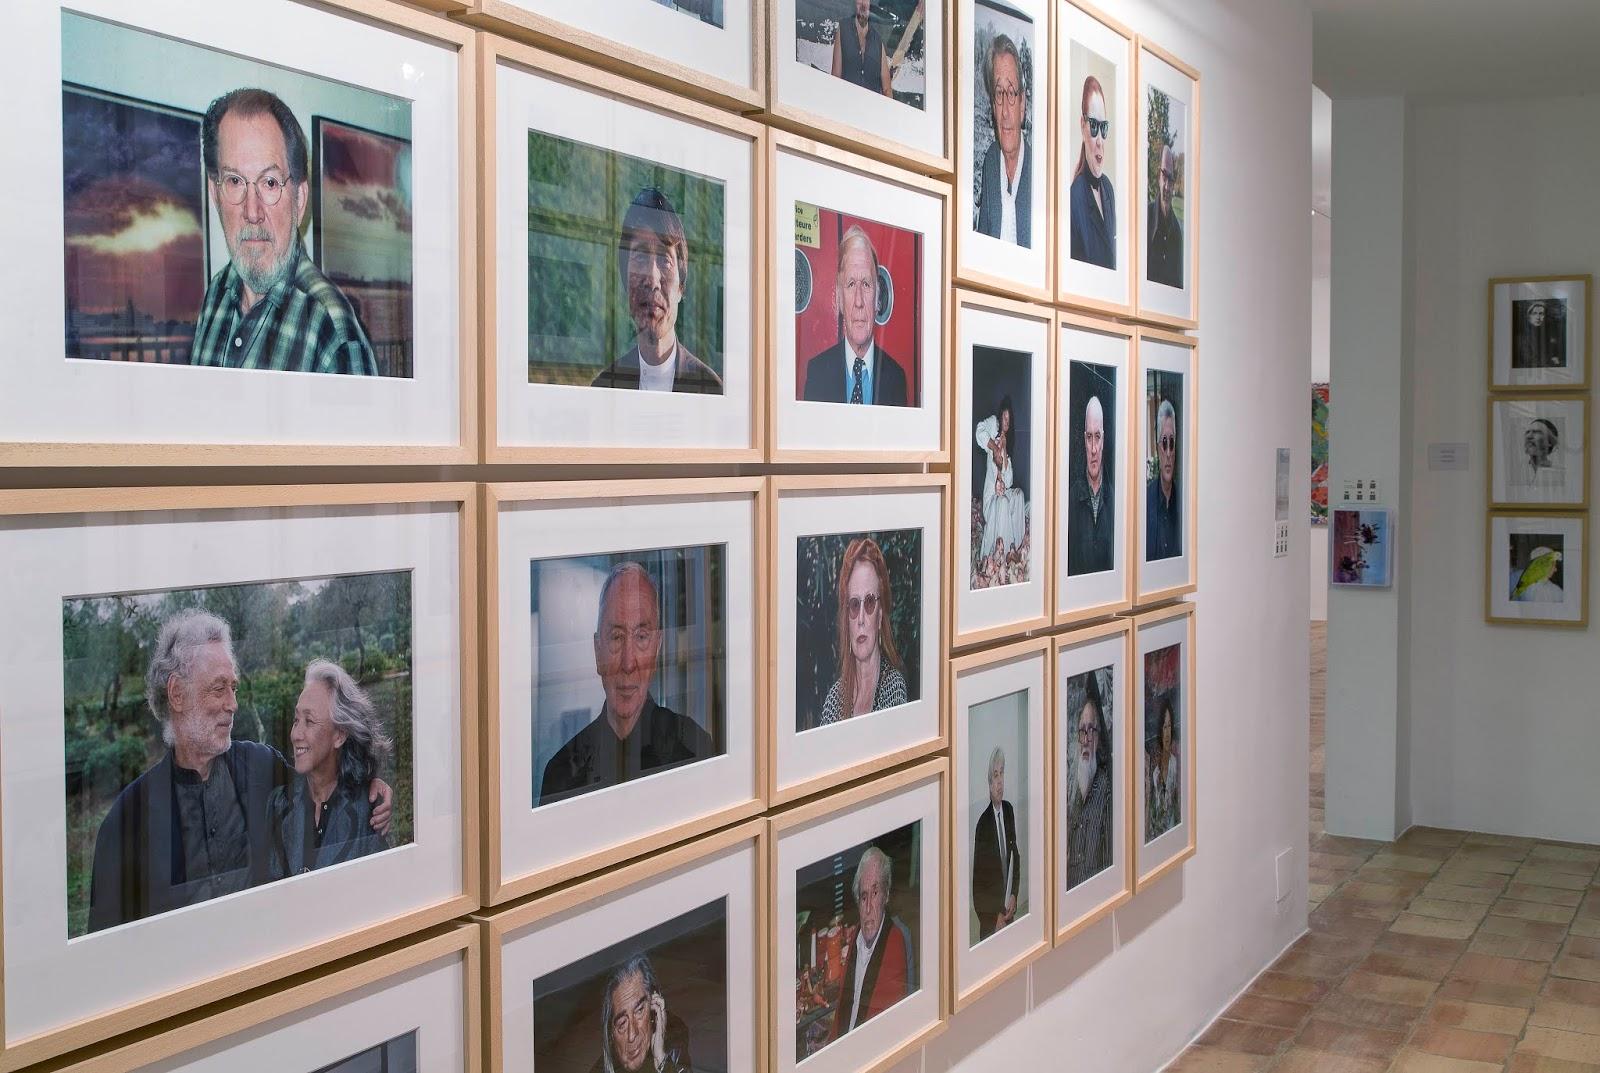 8d9adb2e4 Museo Sa Bassa Blanca